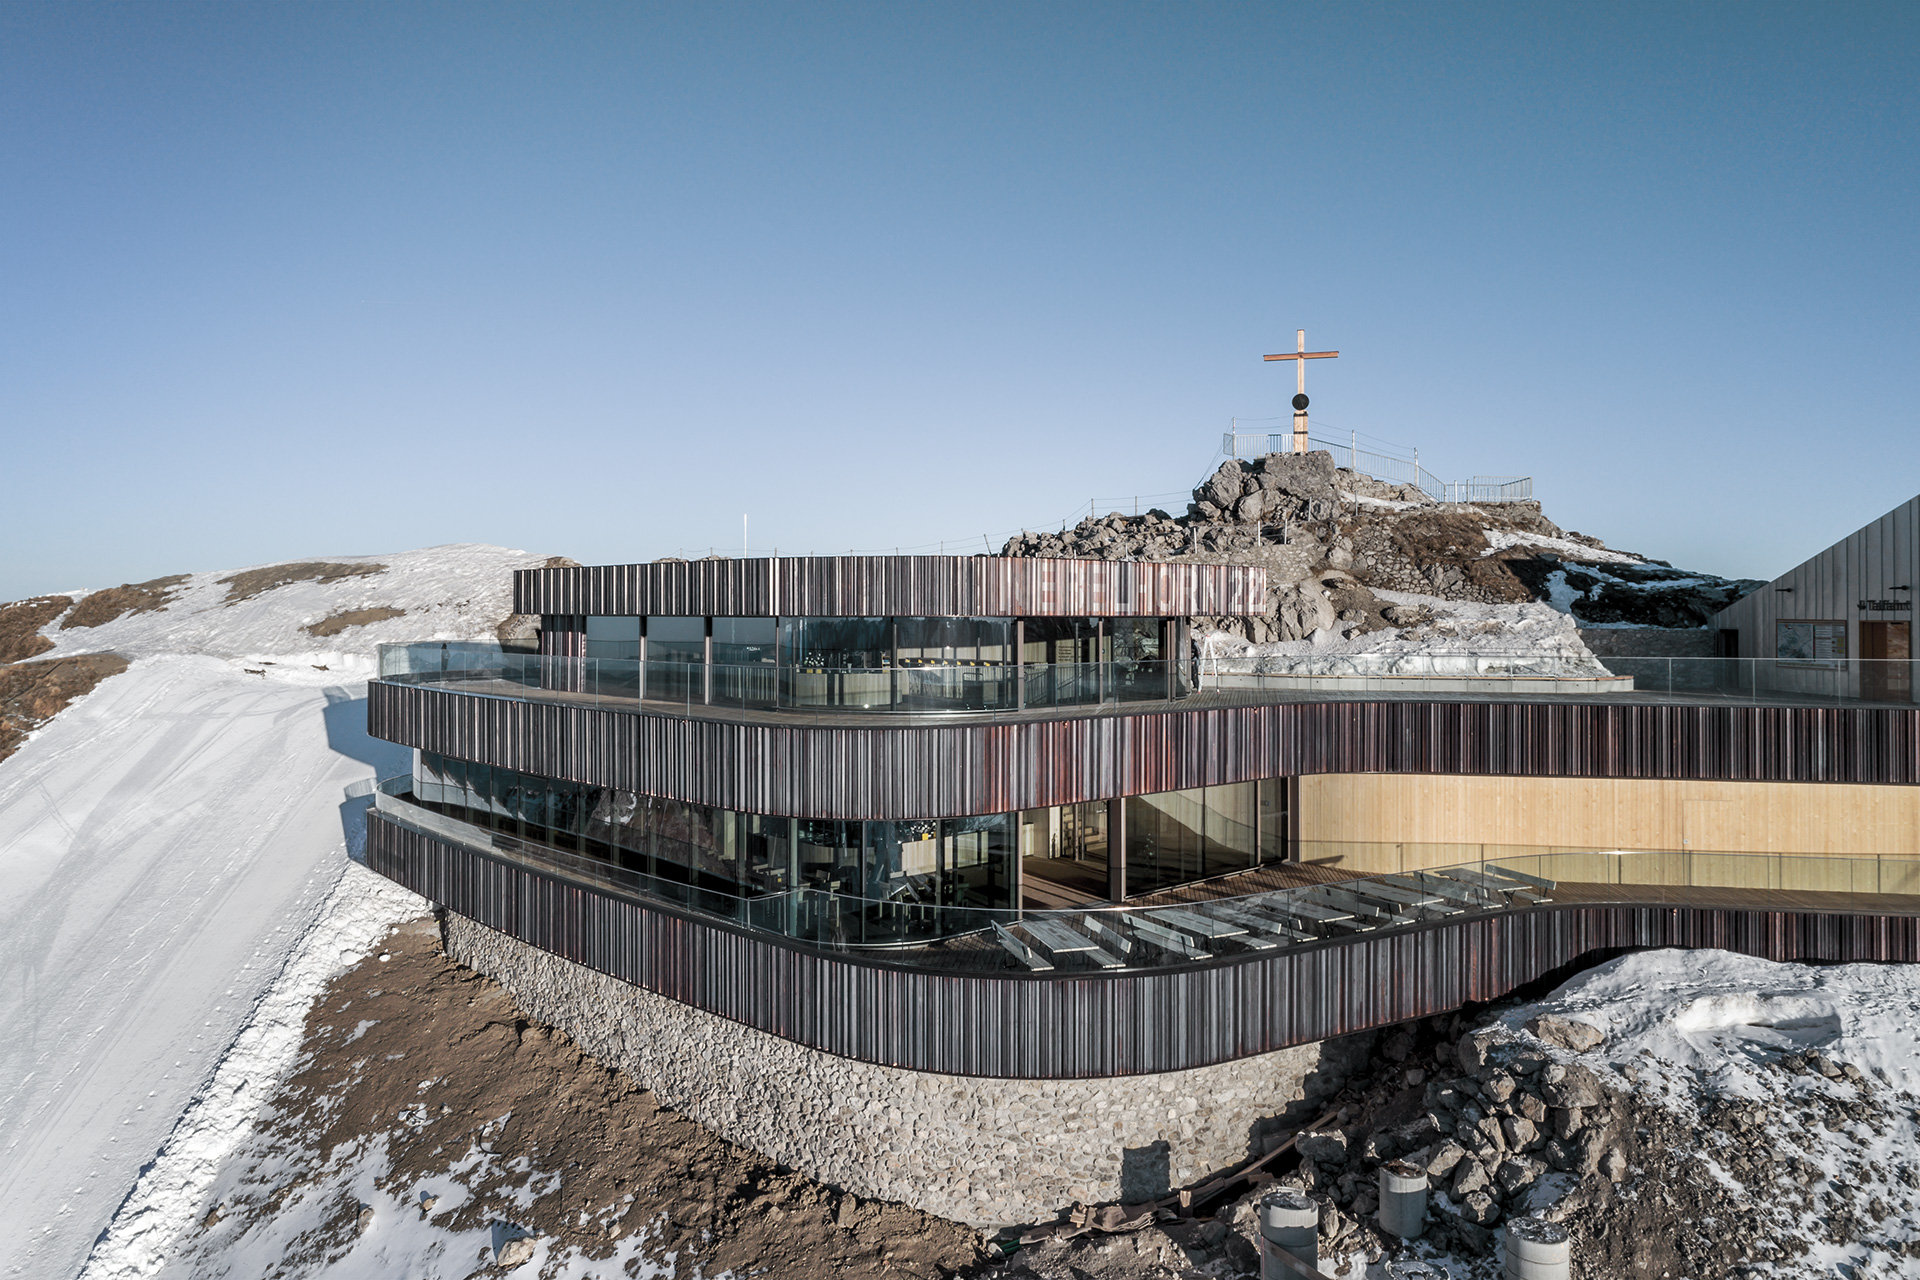 Gipfelrestaurant Nebelhorn 2224 Oberstdorf